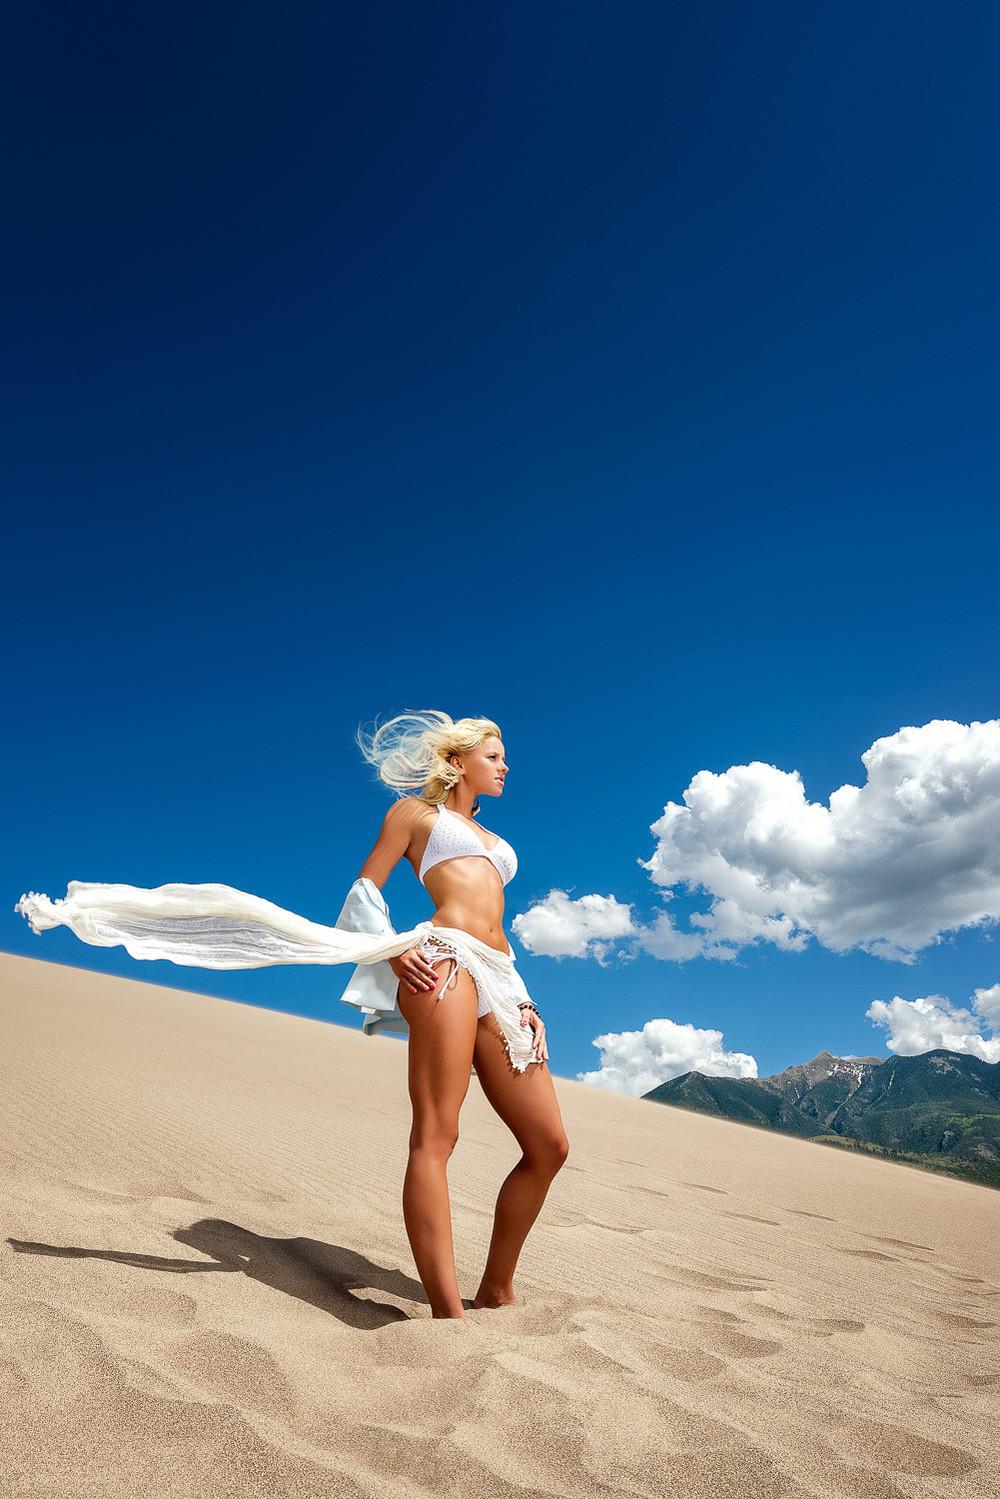 mzp image sand dunes.jpg